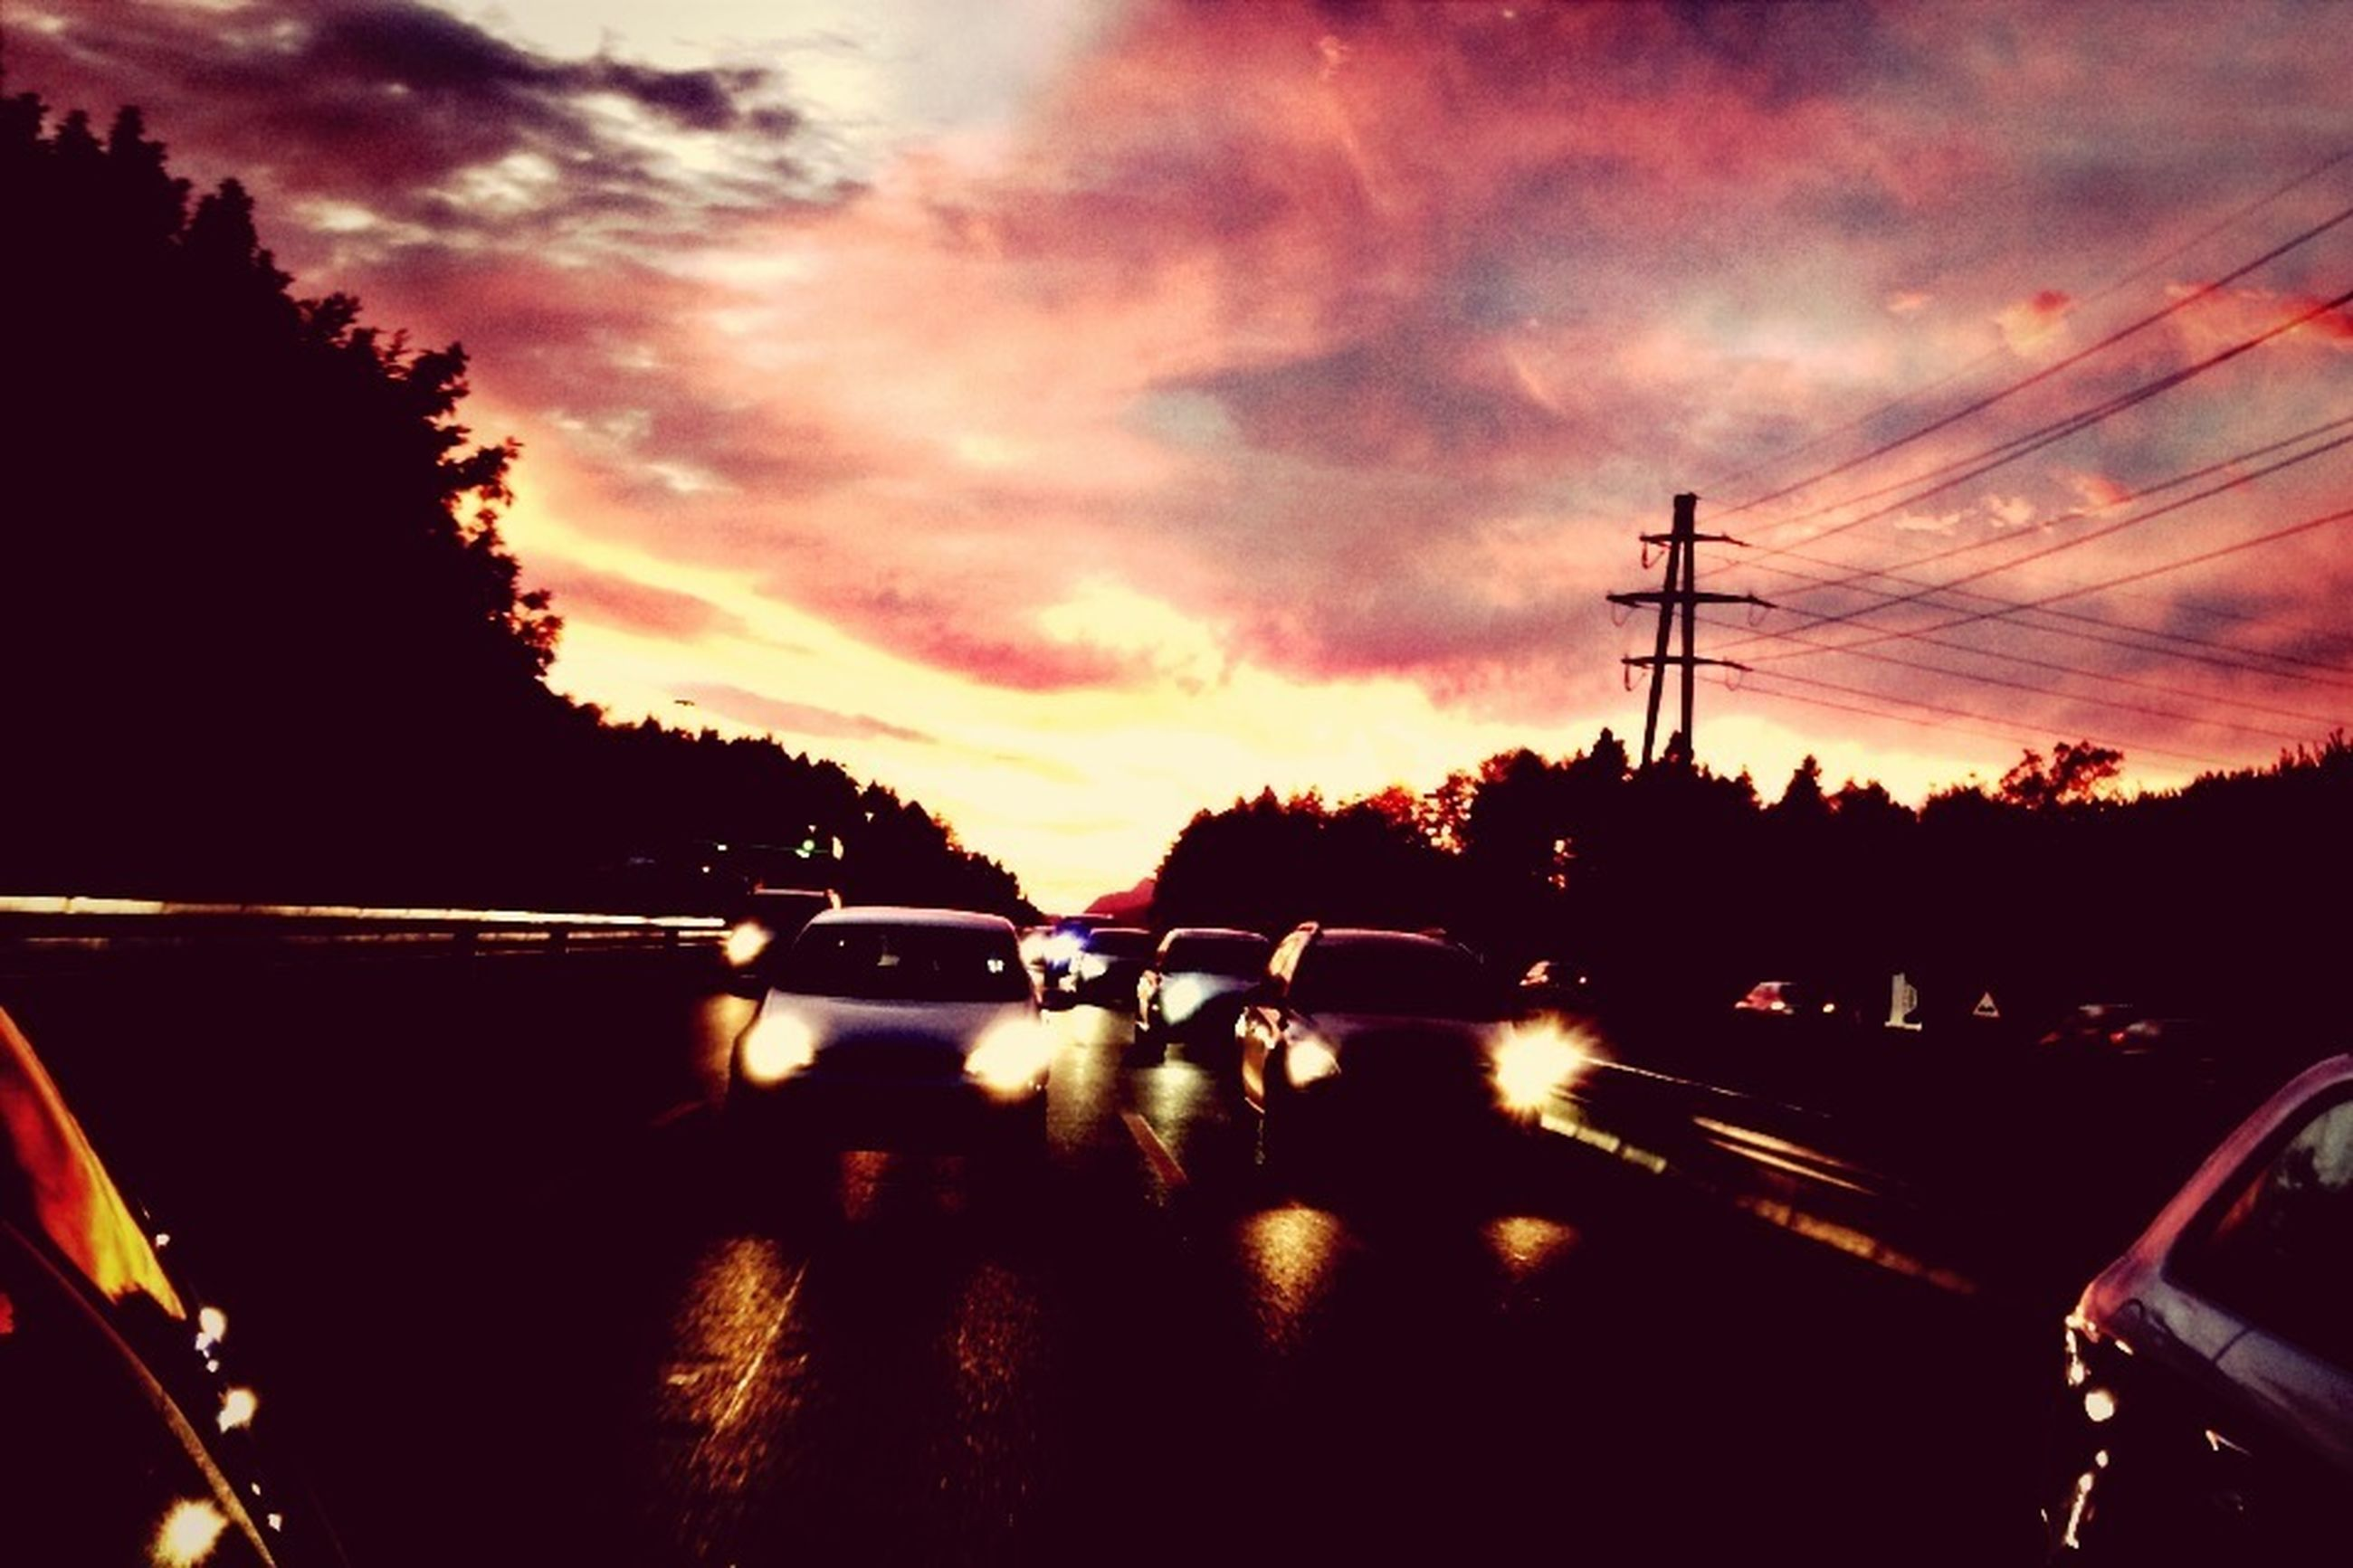 transportation, mode of transport, sunset, land vehicle, car, sky, silhouette, cloud - sky, orange color, on the move, travel, road, tree, electricity pylon, street, power line, vehicle interior, windshield, reflection, street light